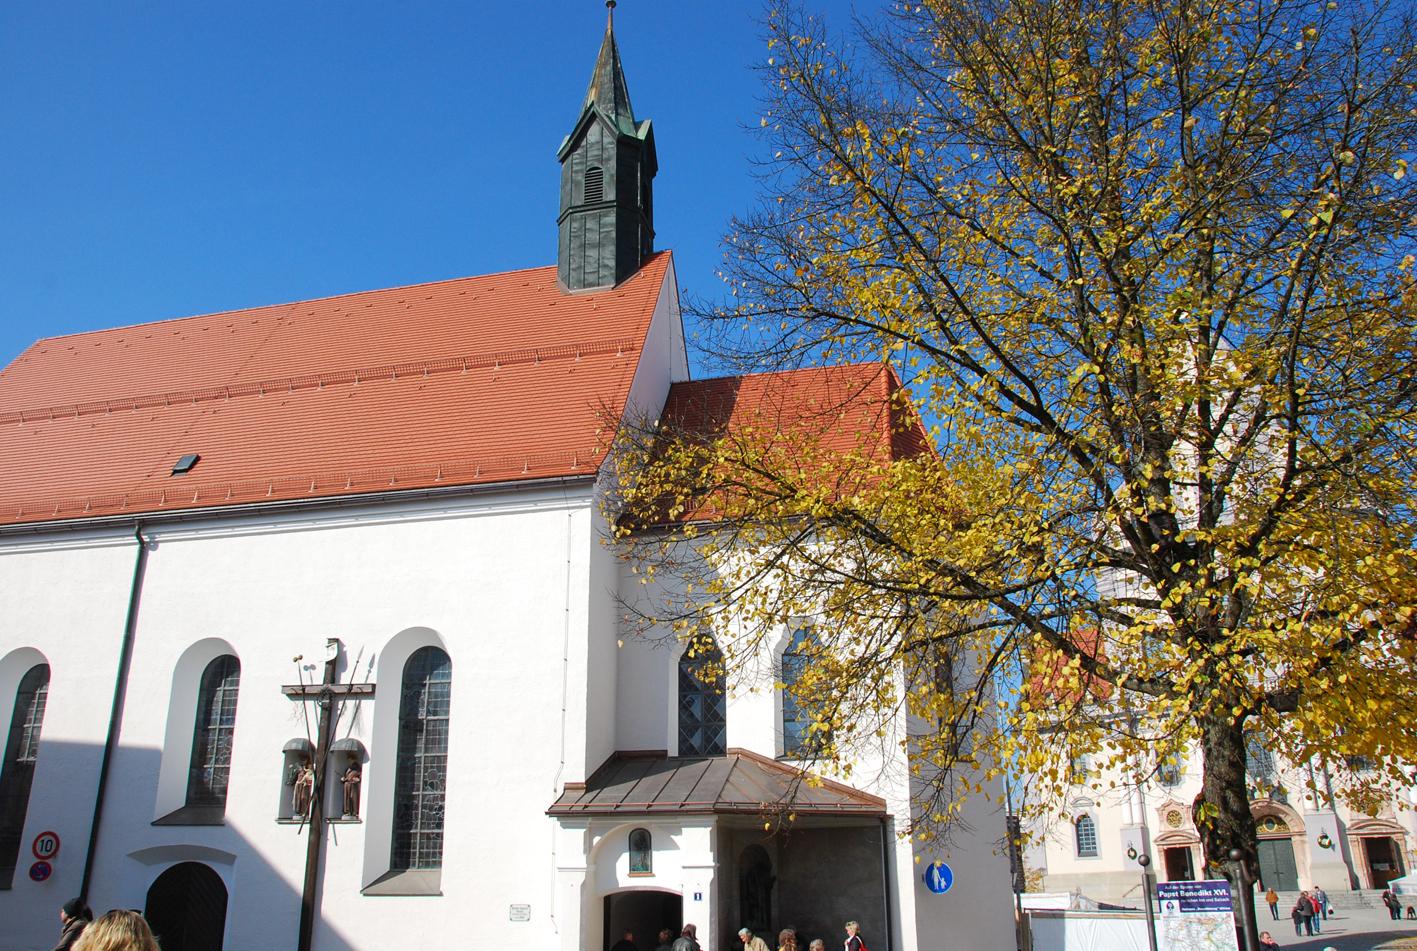 2020 06 22 aoelfb stkonradkloster altoetting